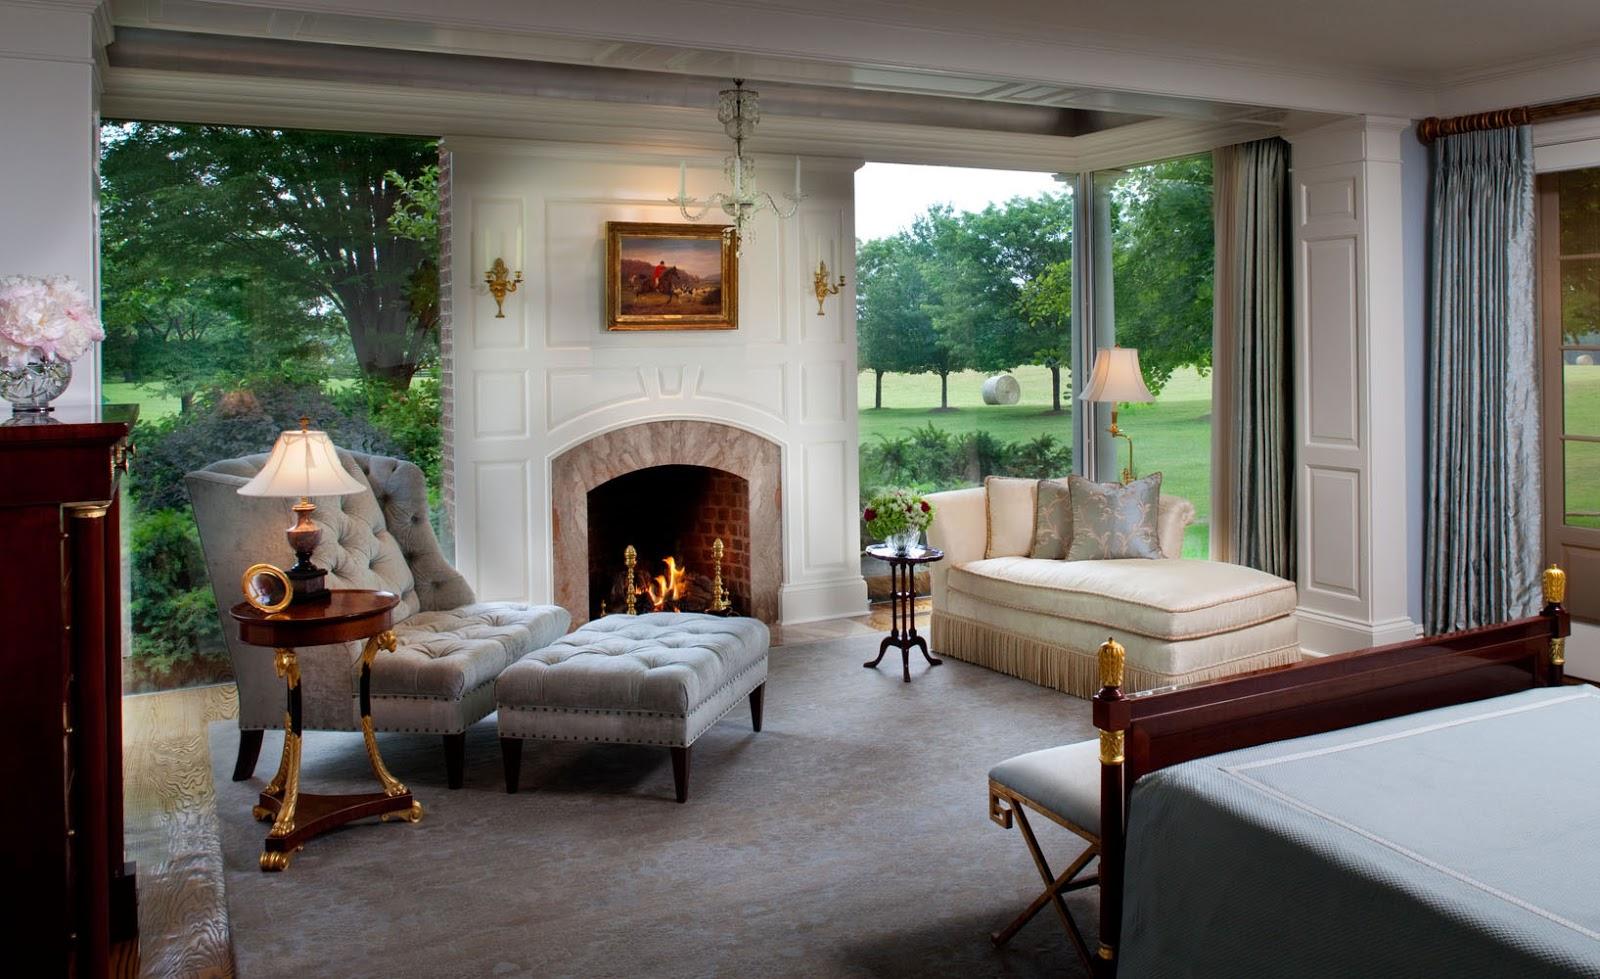 House Interior Design | Best Interior